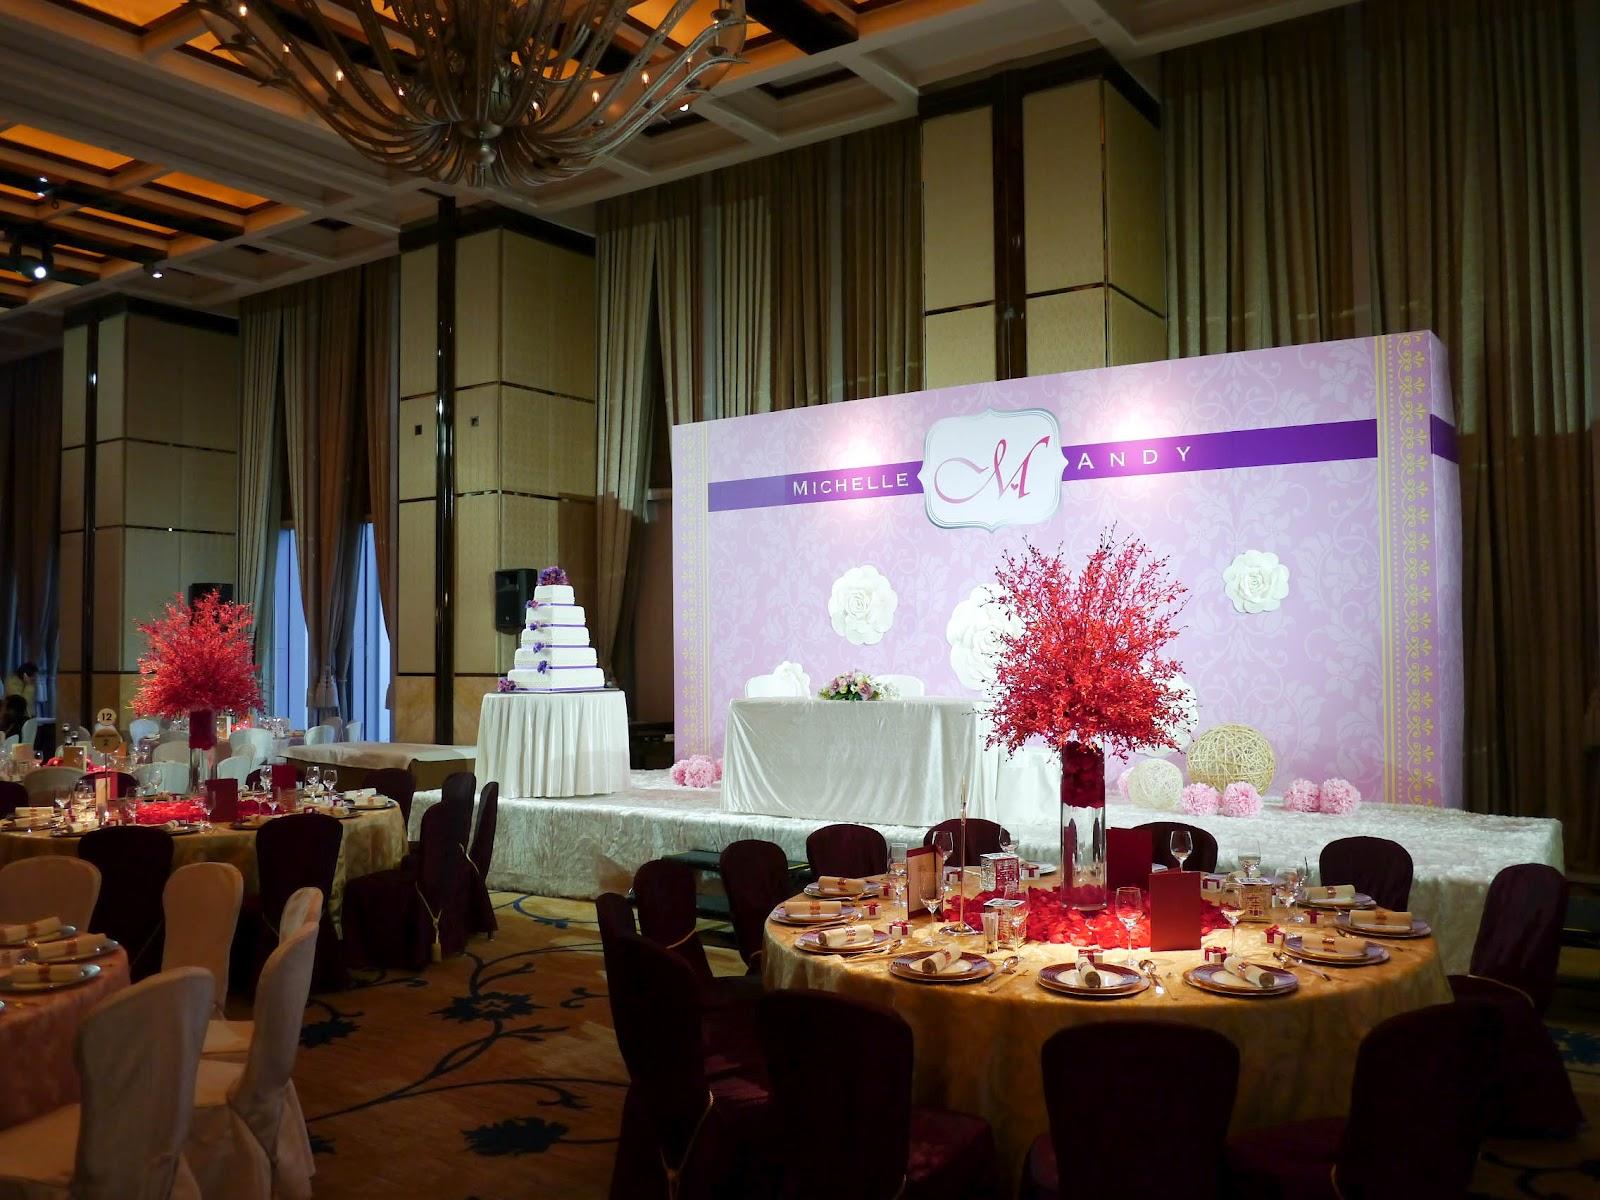 Lily sarah floral studio a thematic wedding four seasons hong kong a thematic wedding four seasons hong kong harbourview ballroom junglespirit Images